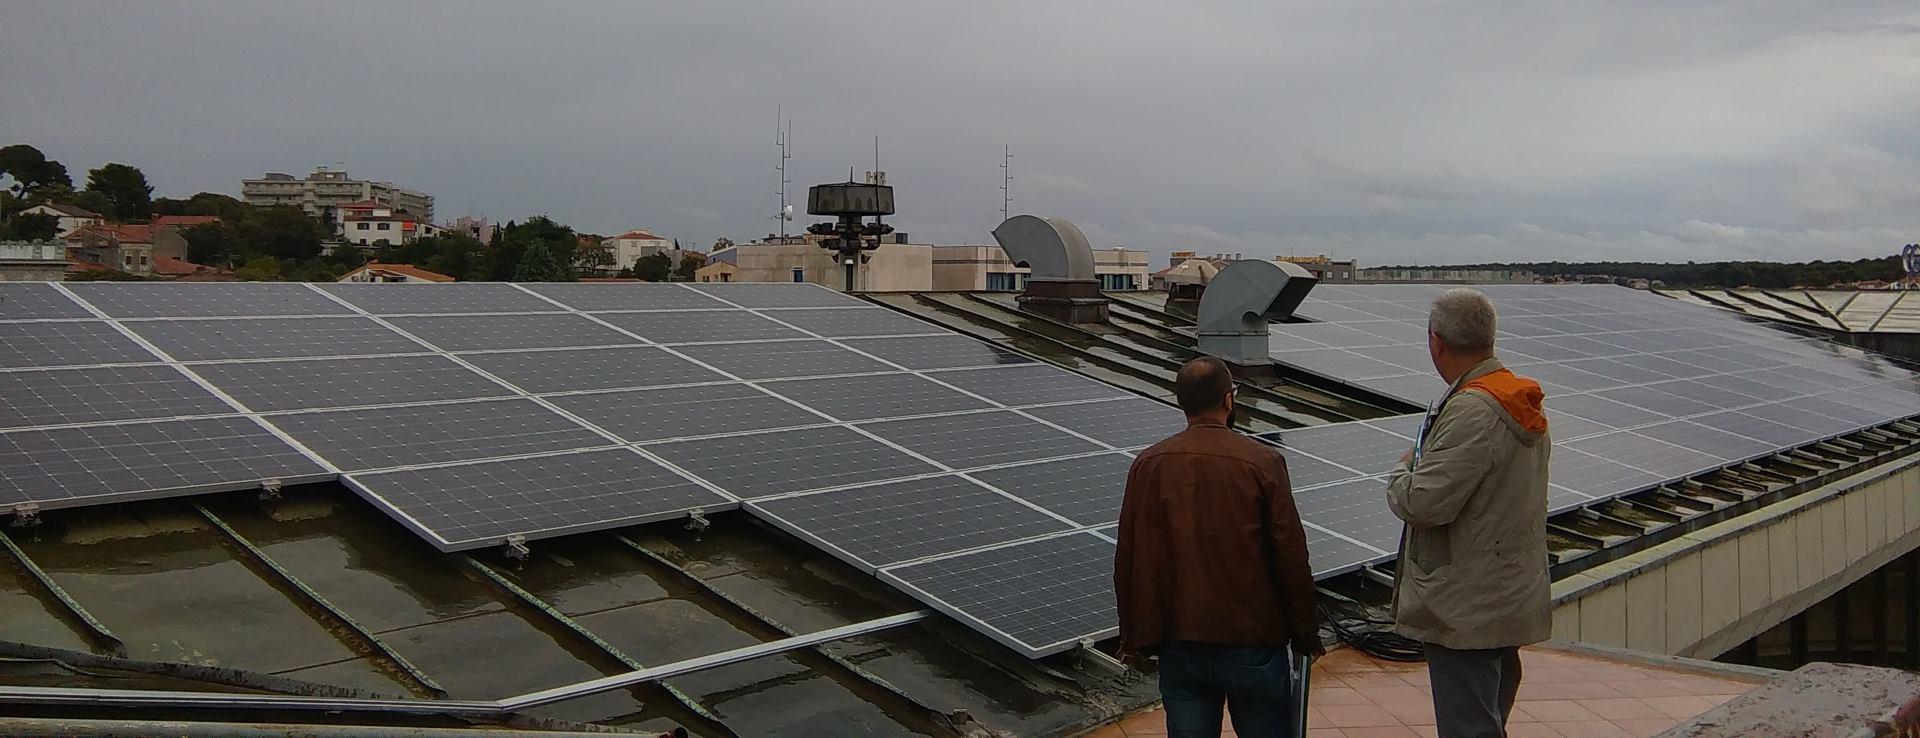 OTP banka pustila u pogon treću vlastitu solarnu elektranu